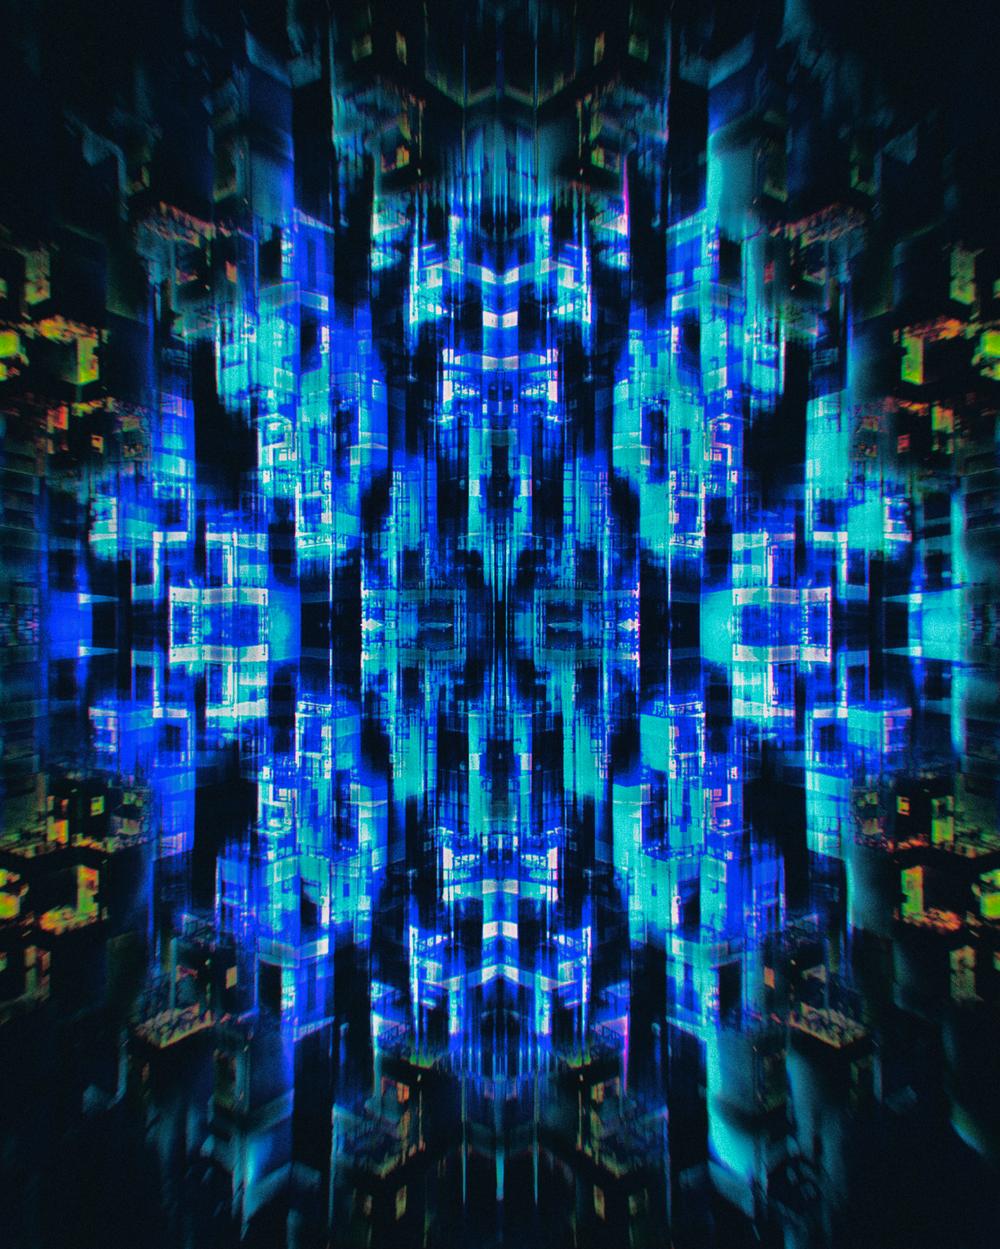 Complex - 24-07-18